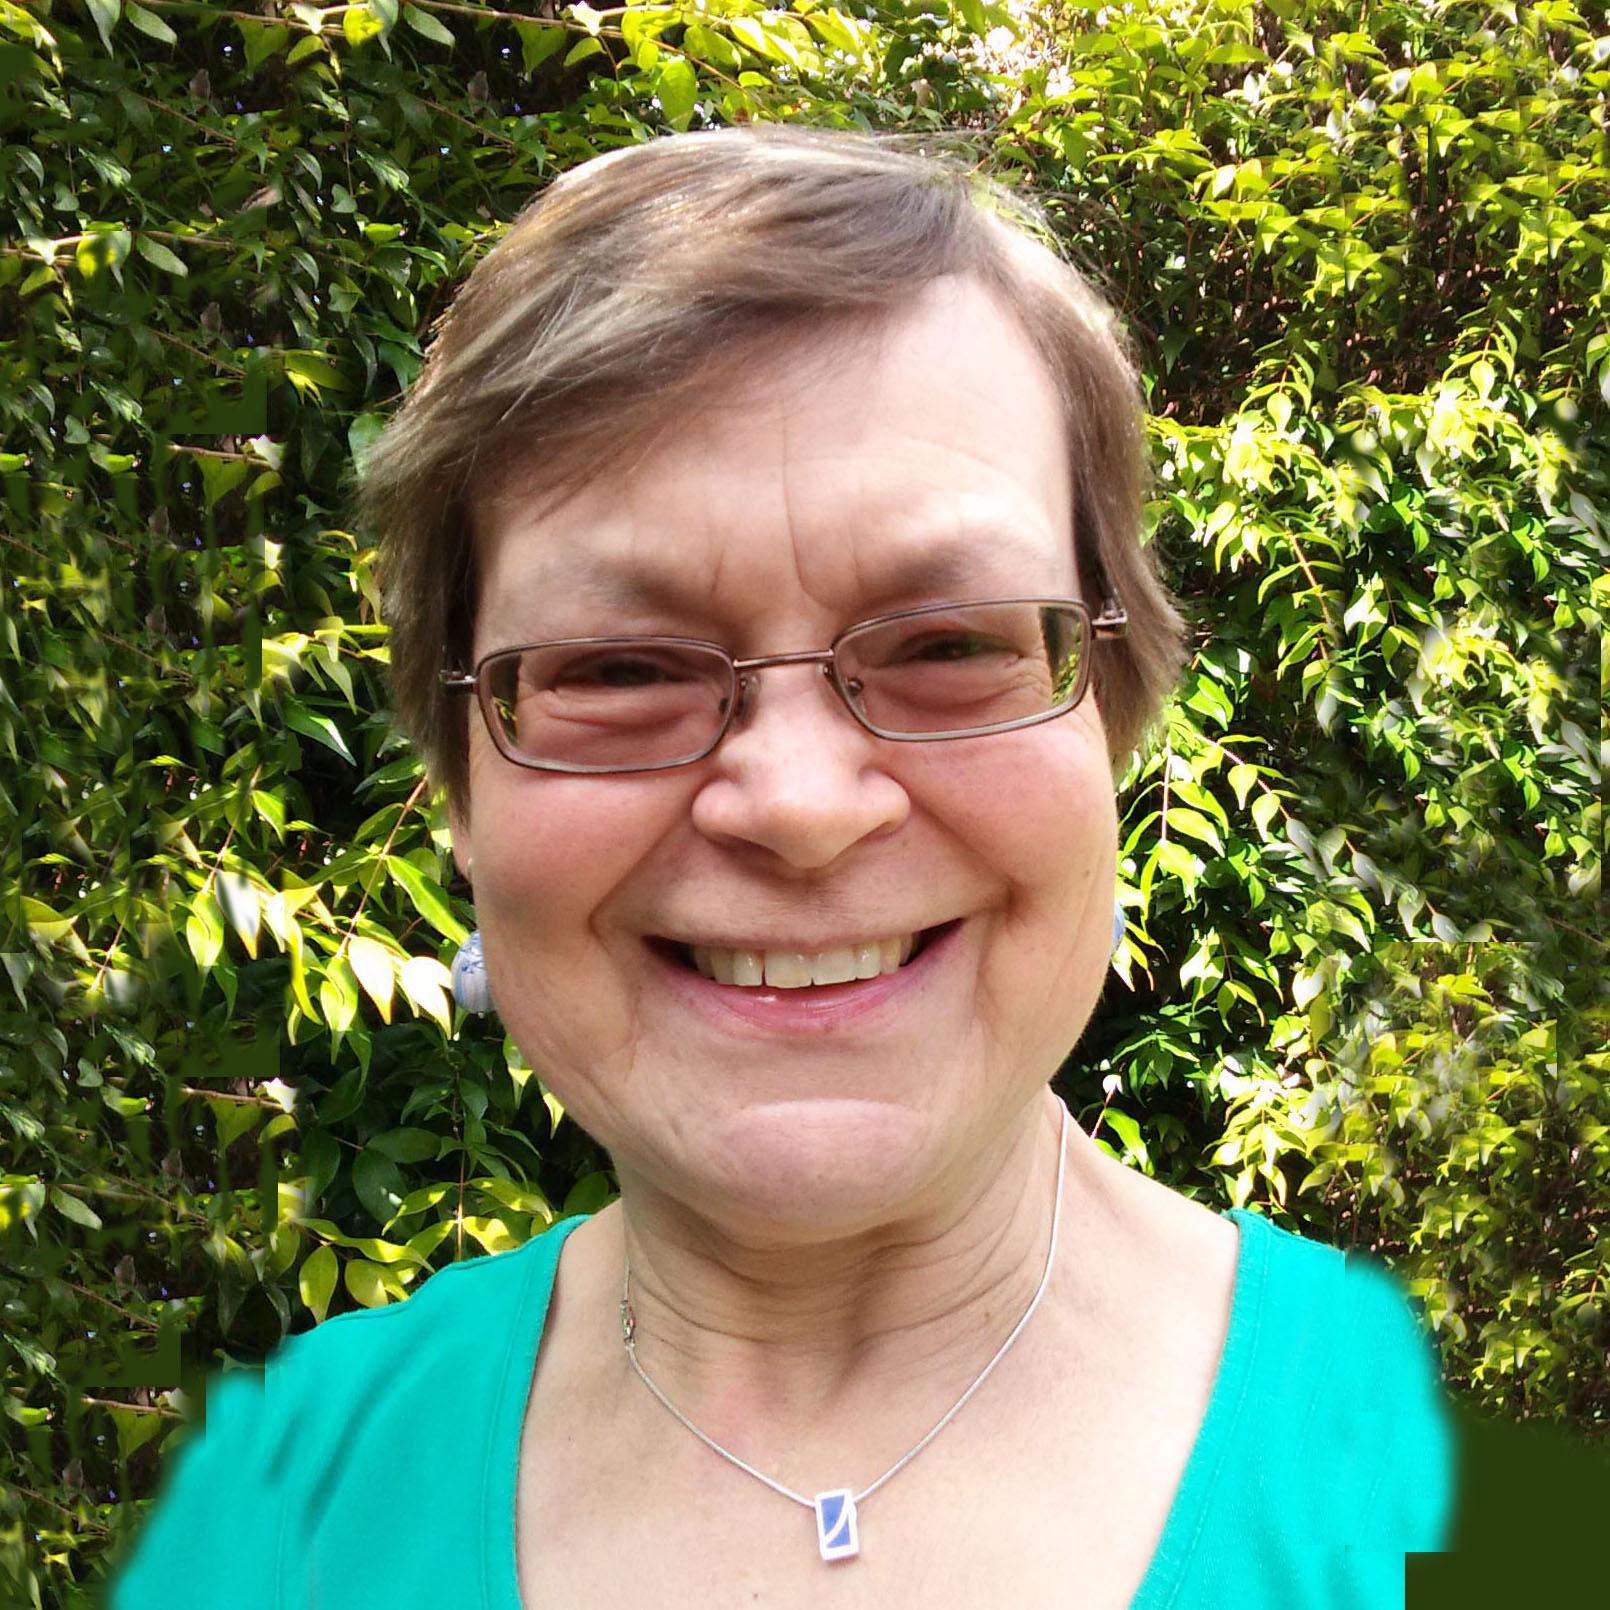 Hilary Cadman